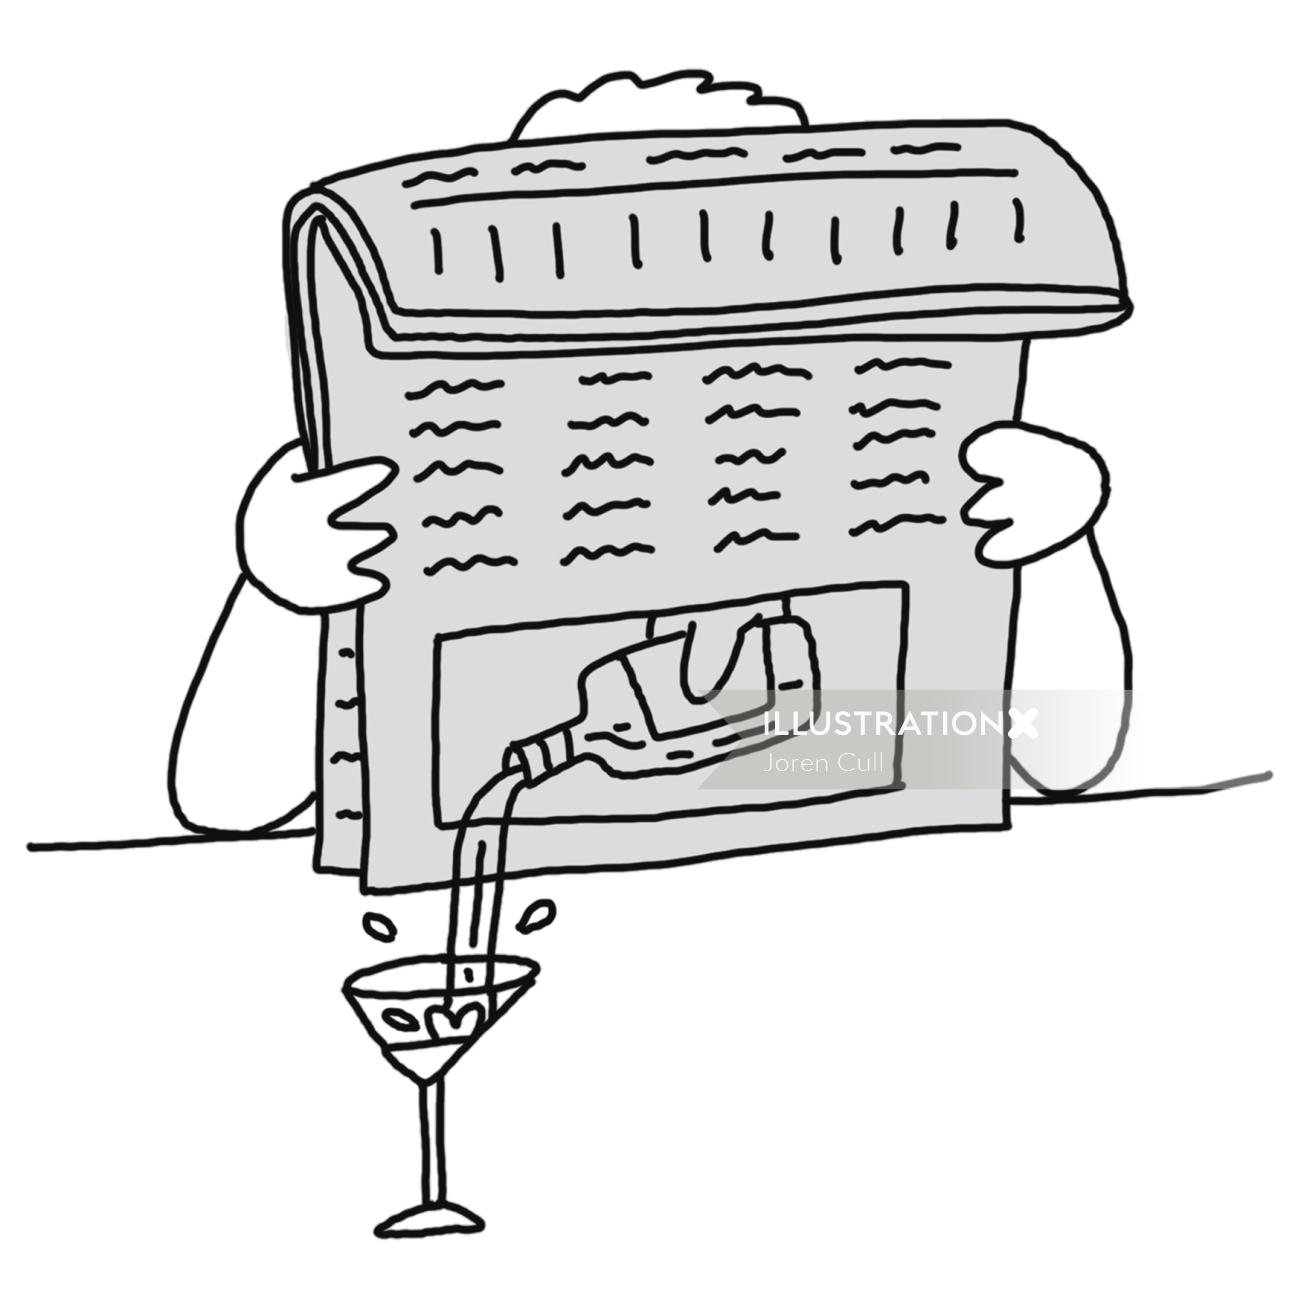 Comic newspaper illustration by Joren Cull